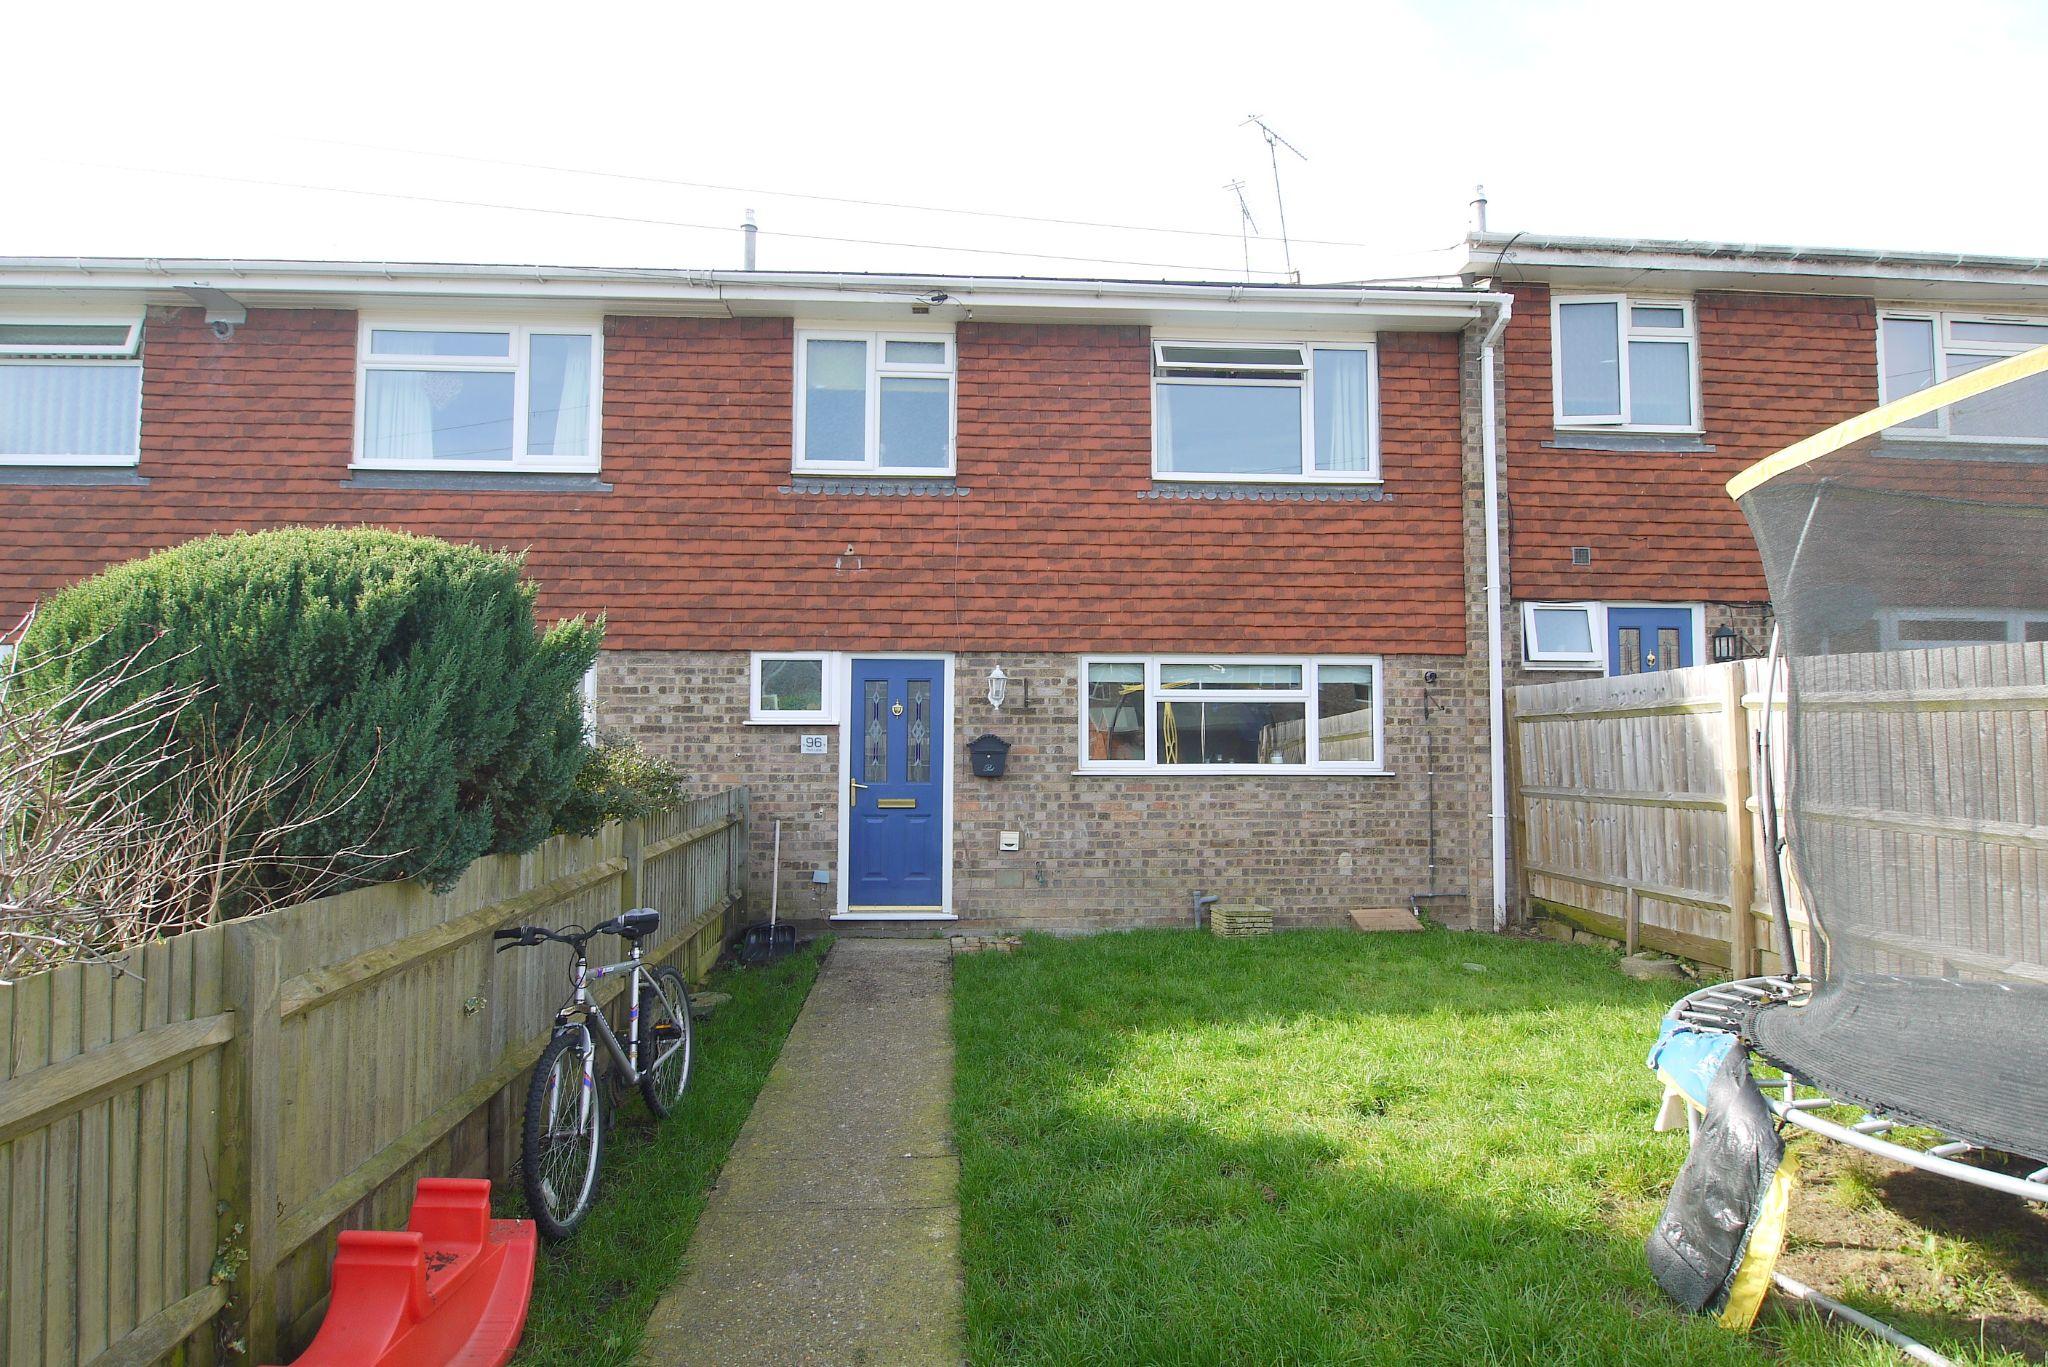 3 bedroom mid terraced house Sold in Sevenoaks - Photograph 1